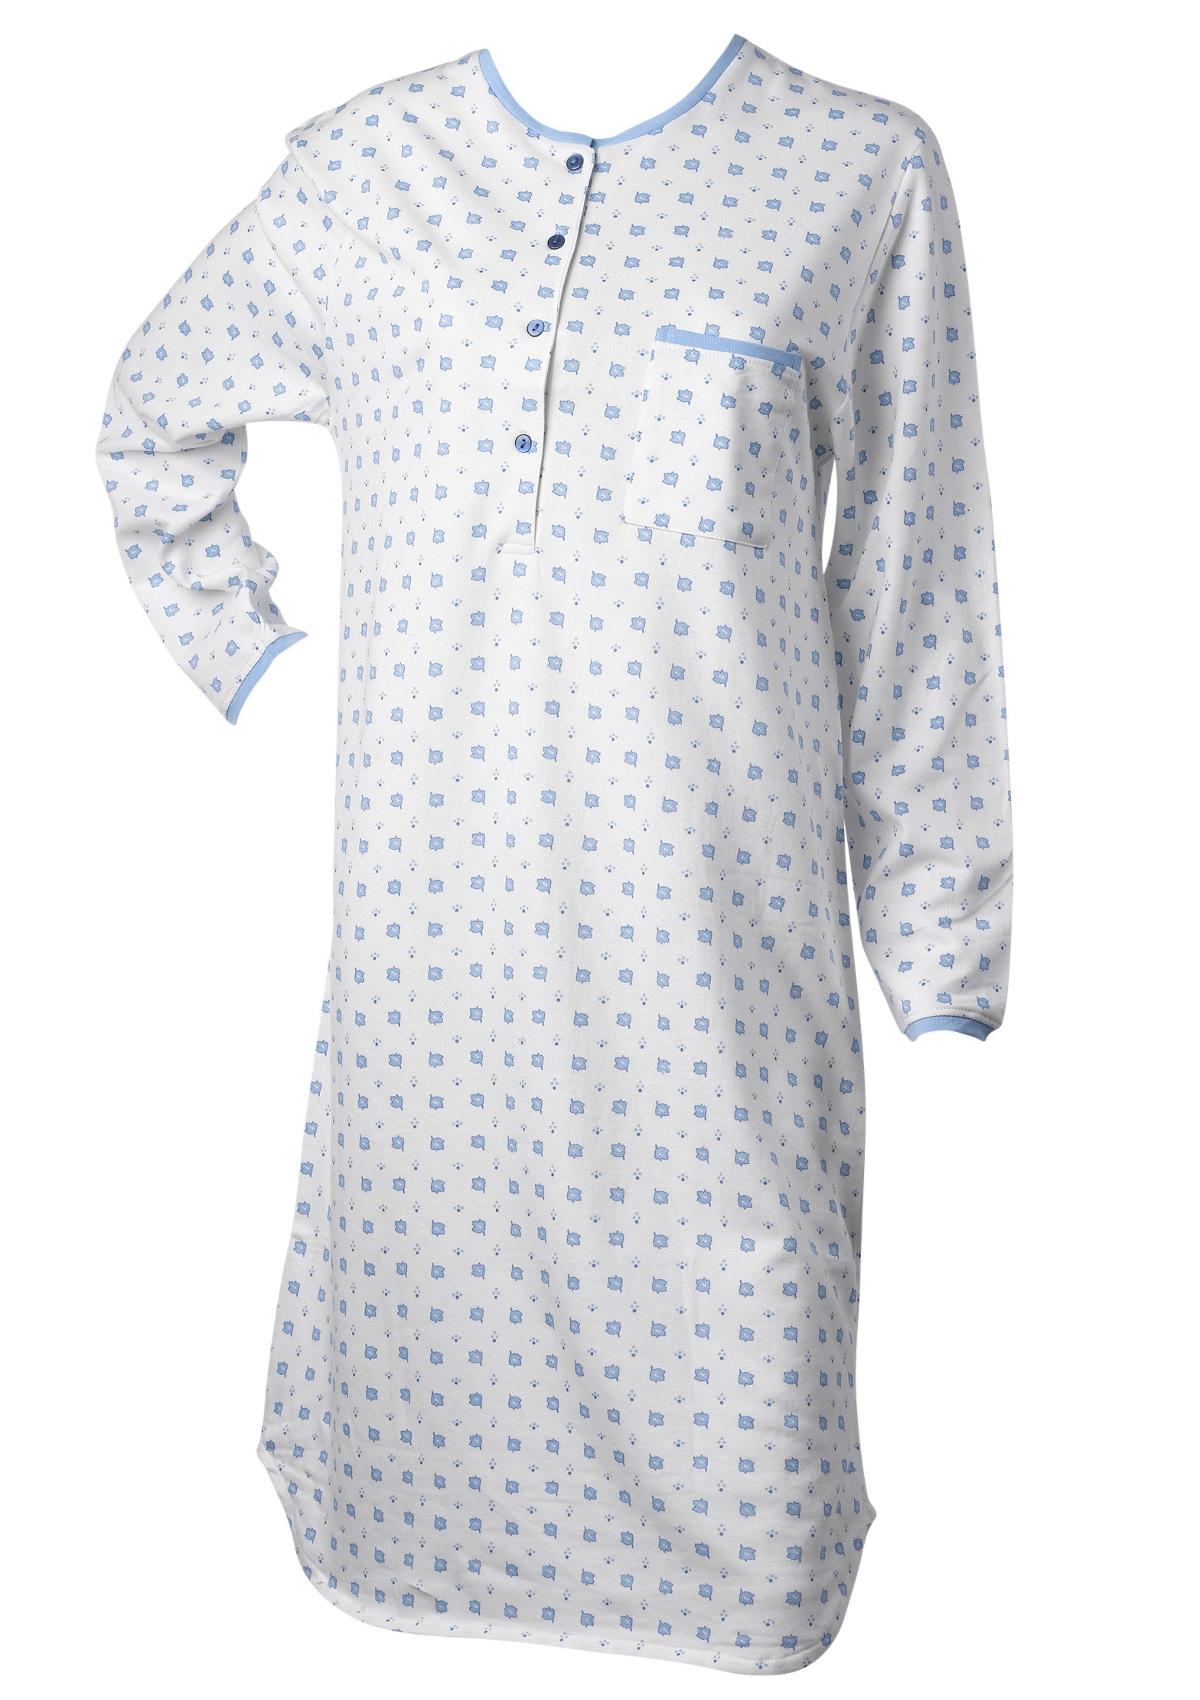 e89bca7581 Nightdress 100% Cotton Long Sleeved Leaf   Polka Dot Nightie Waites  Nightwear